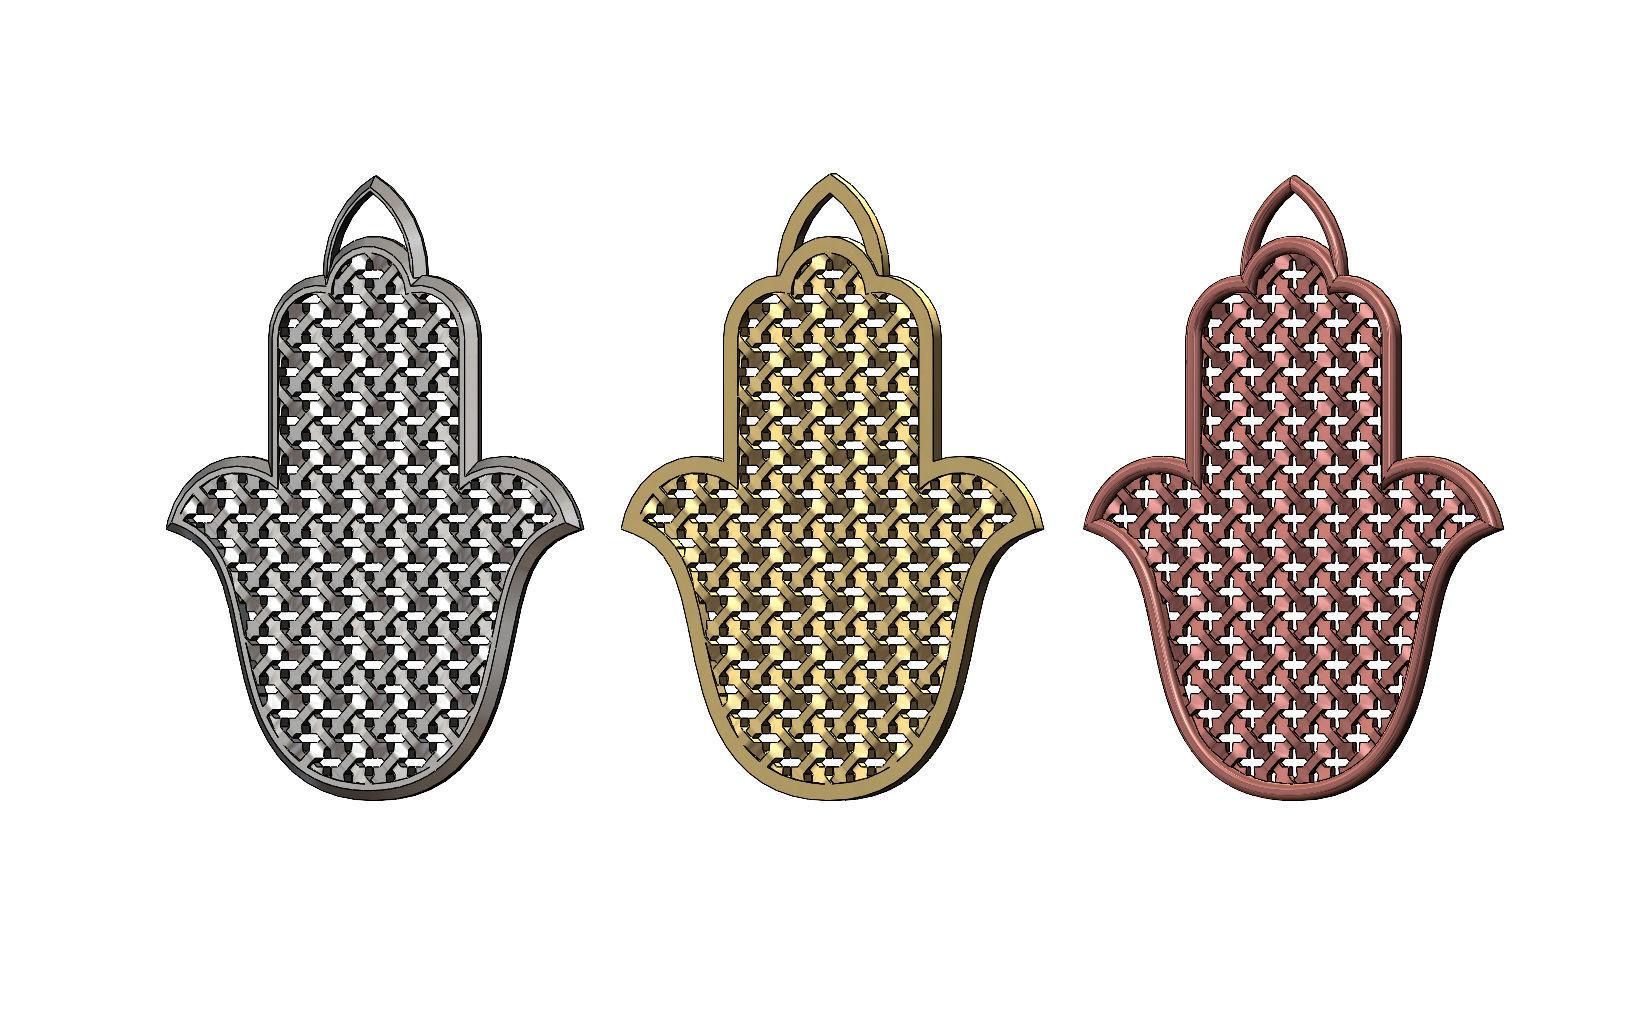 Khamsa Khmissa beldi moroccan pendant with moucharabieh mesh